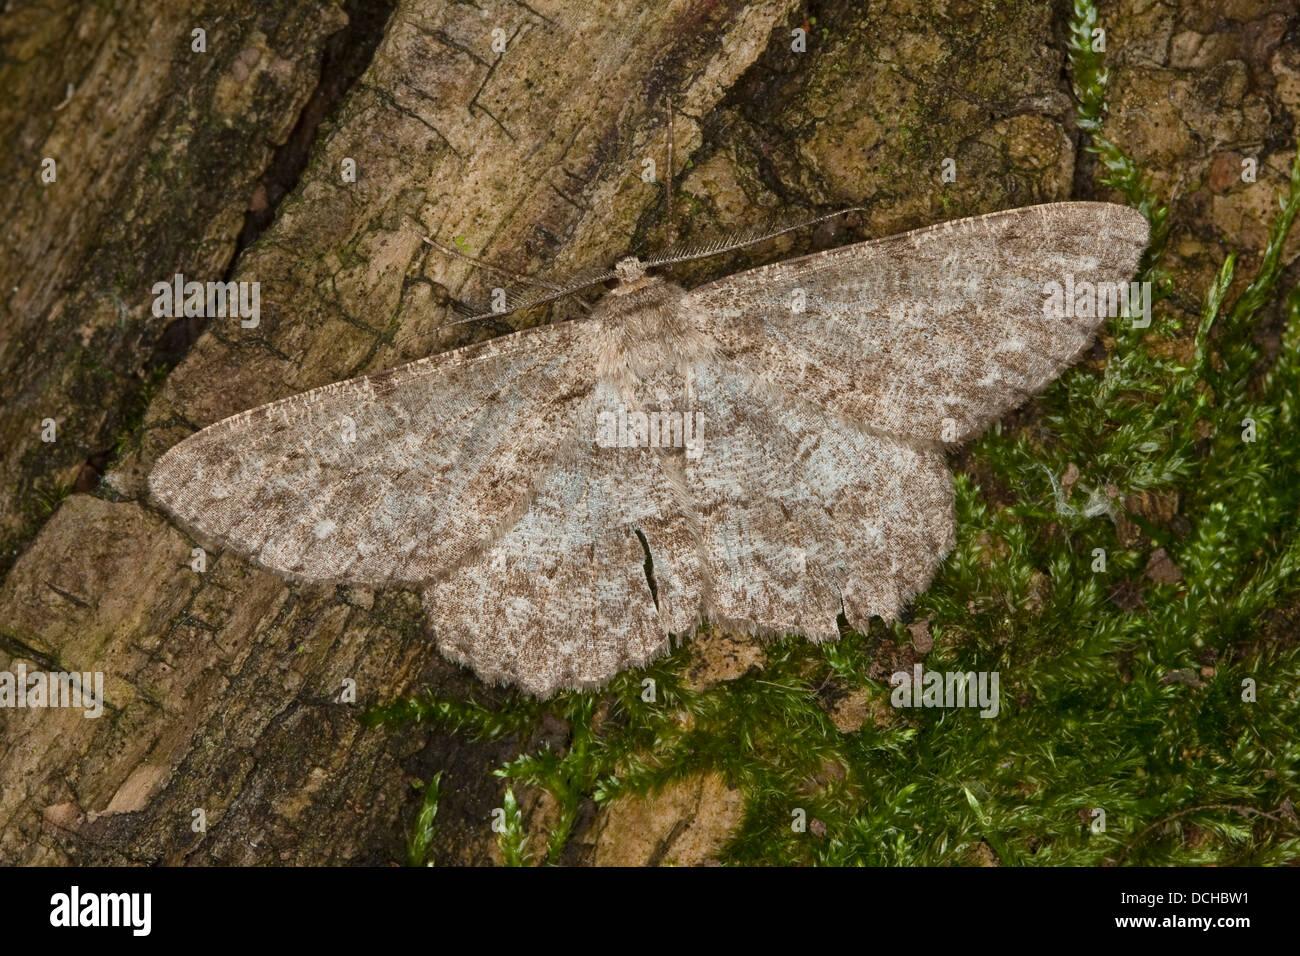 Pale Oak Beauty, Aschgrauer Baumspanner, Aschgrauer Rindenspanner, Hypomecis punctinalis, Boarmia punctinalis - Stock Image